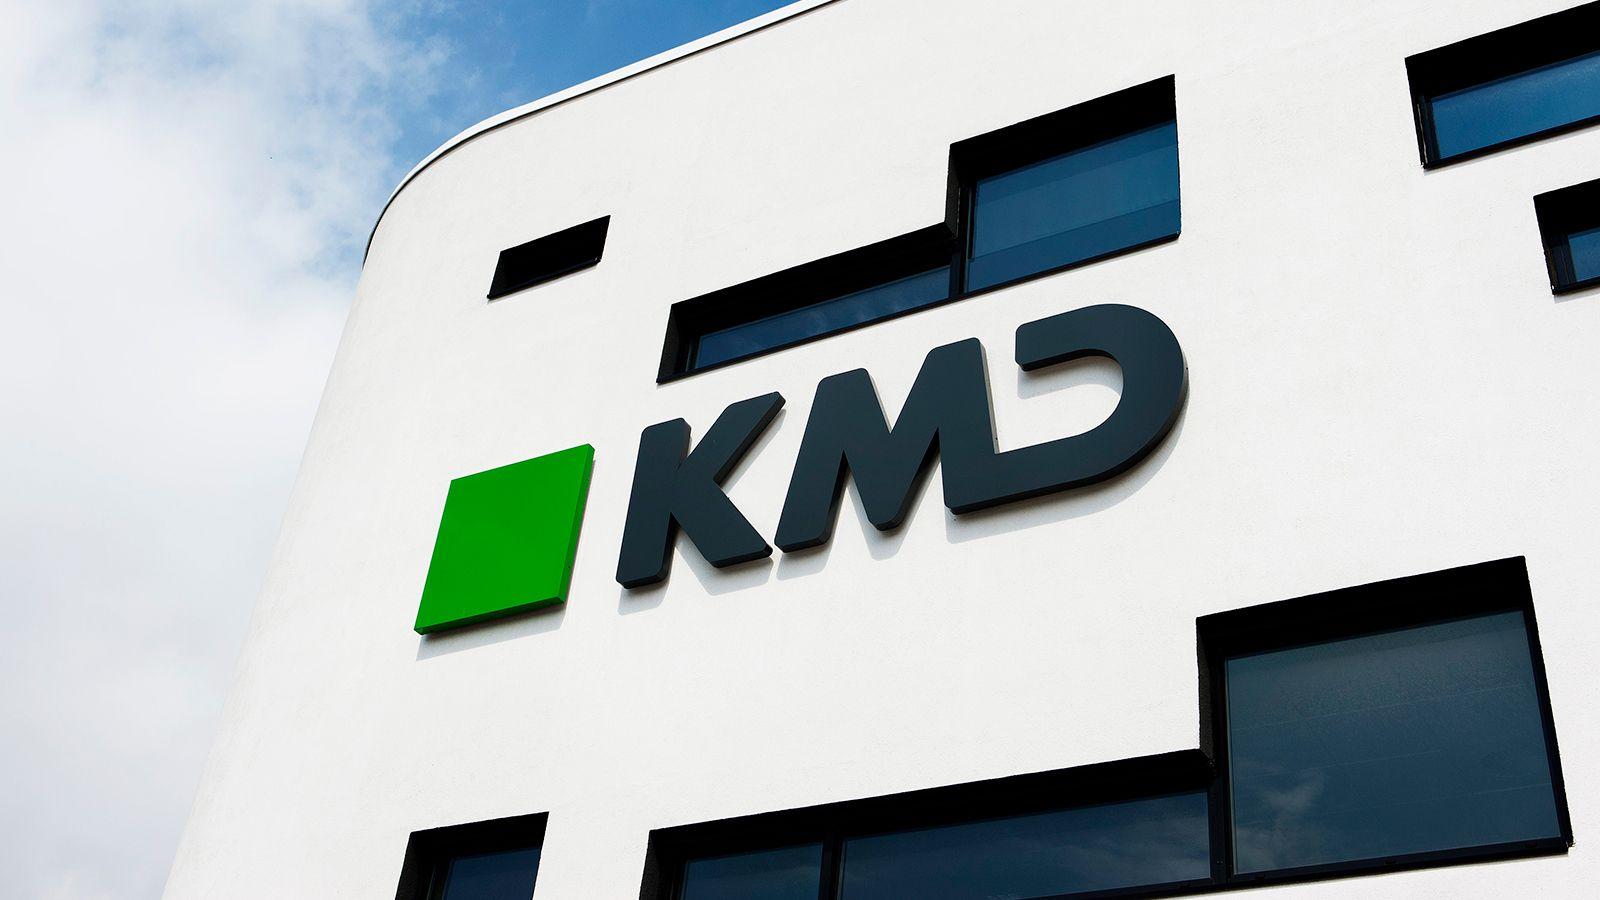 Pensam And Kmd Enter Into It Outsourcing Mega Deal Kmd